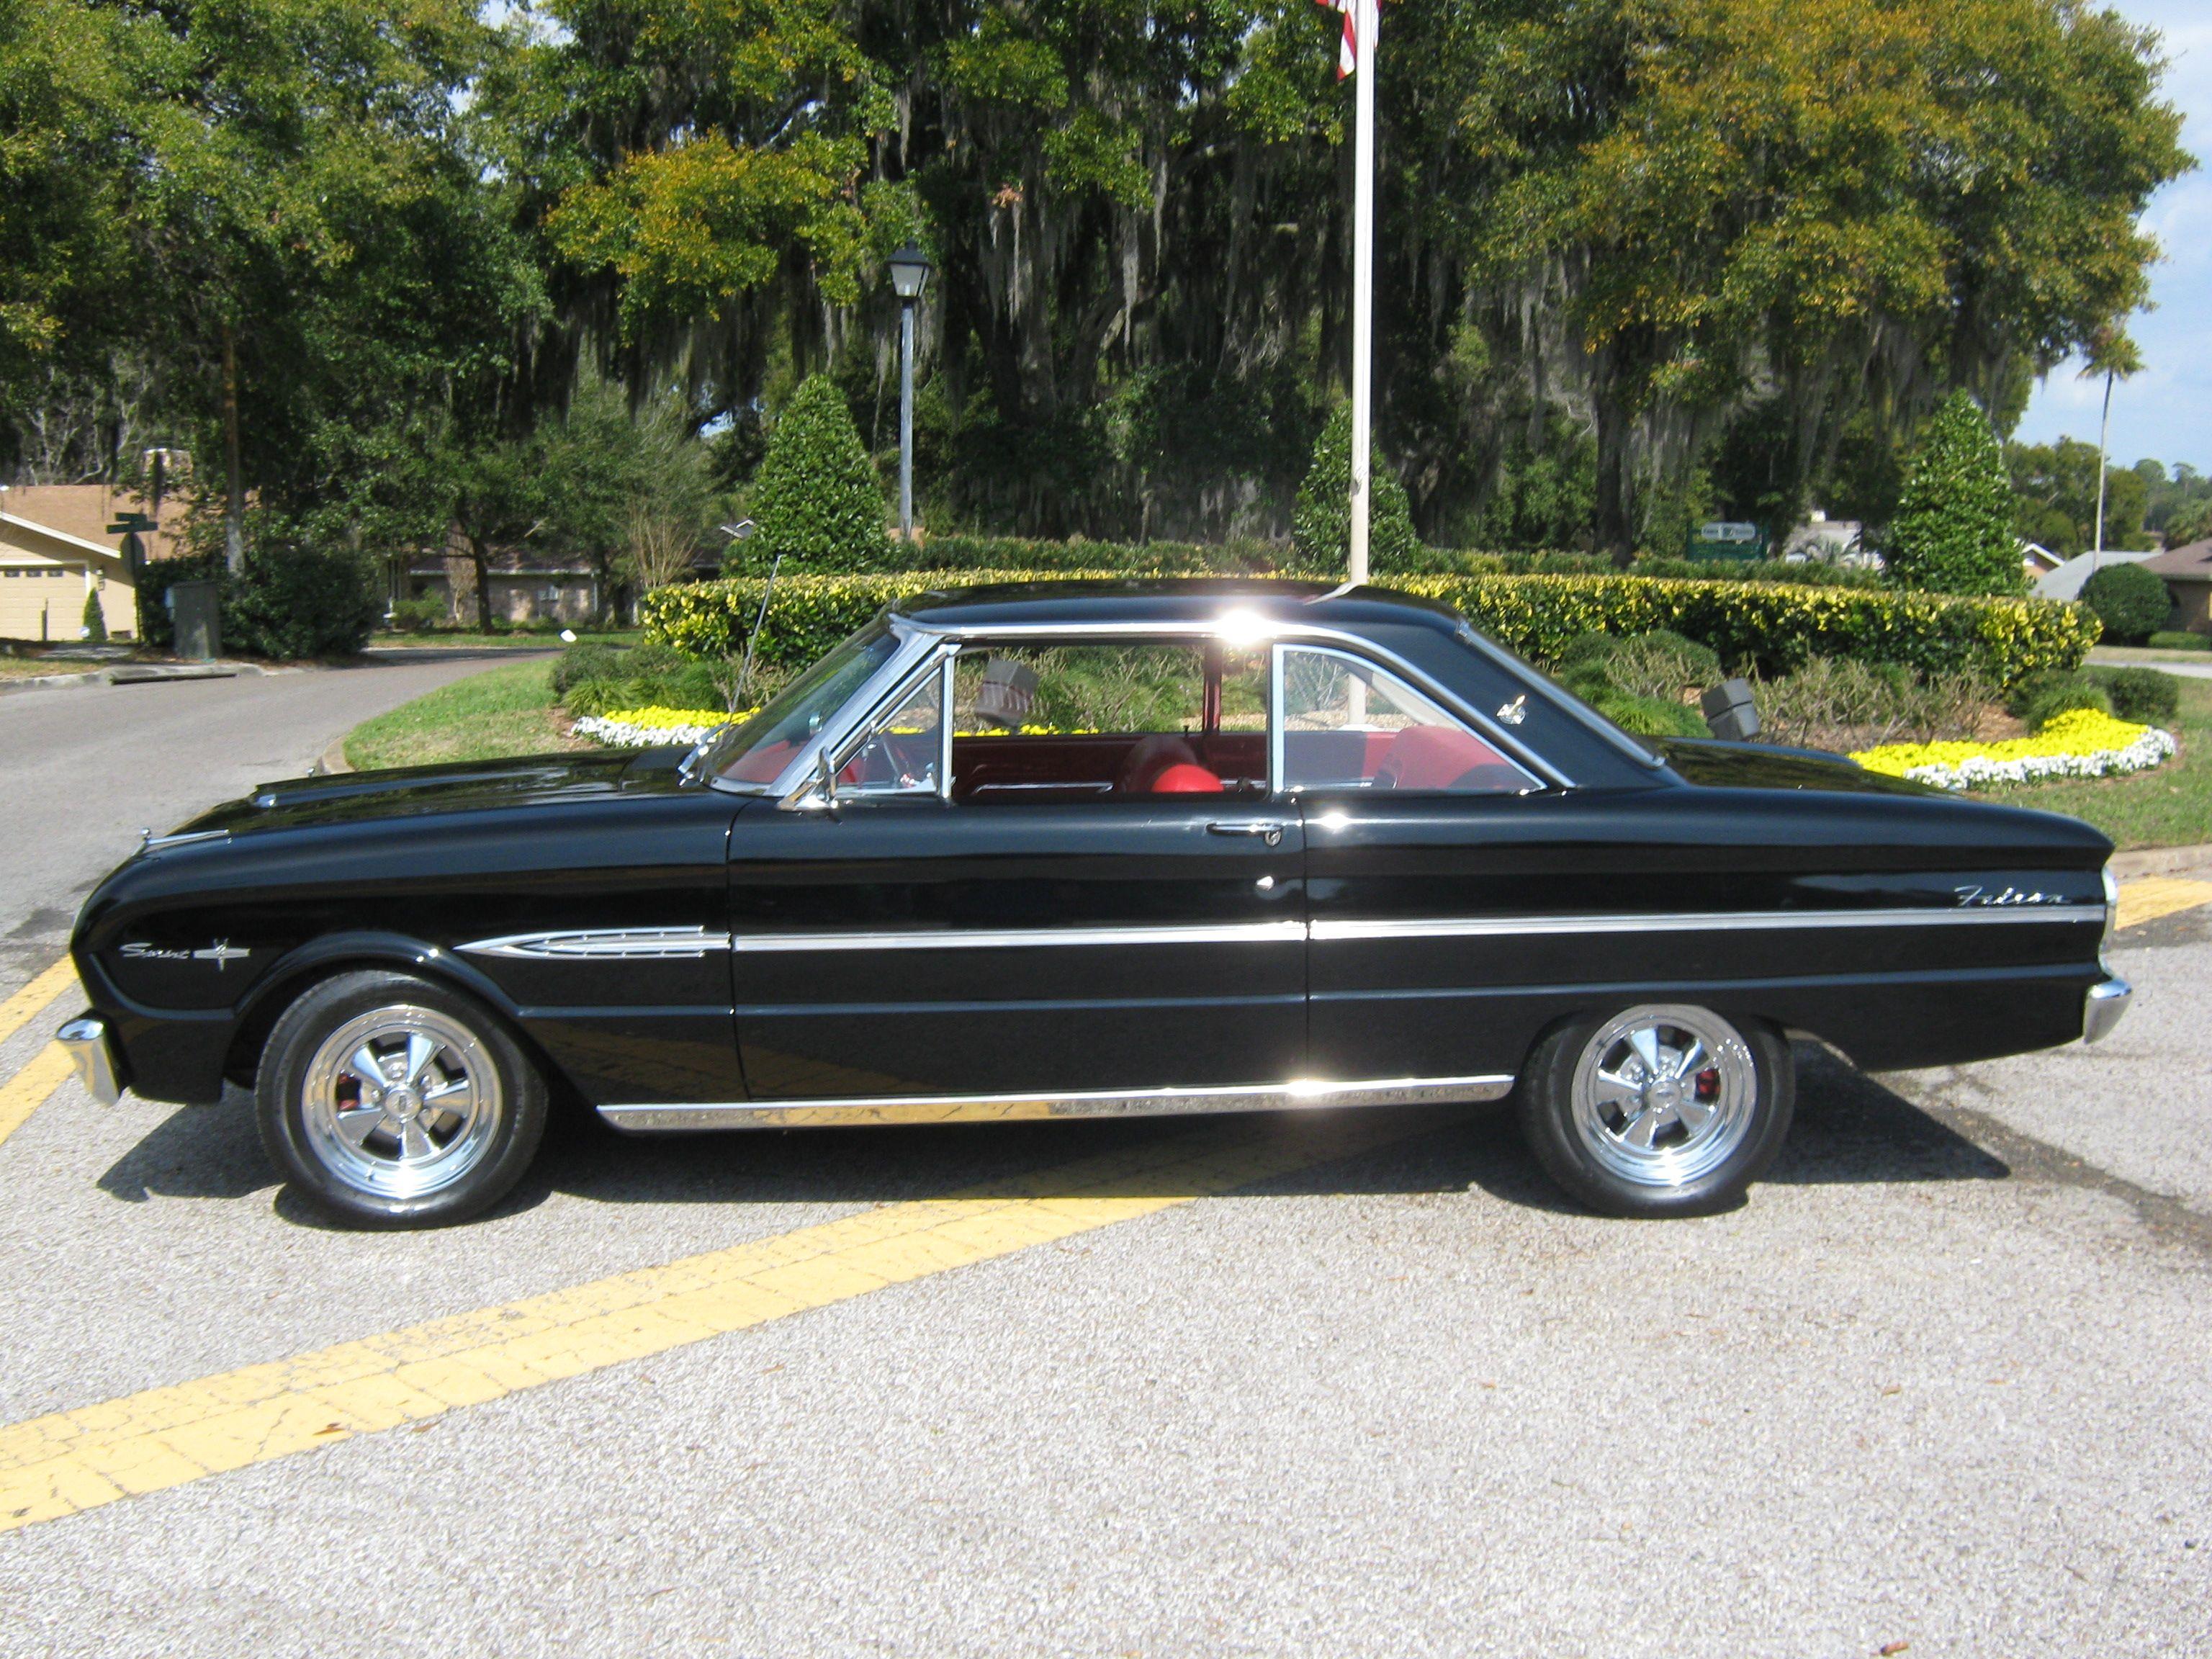 1963 Falcon Sprint For Sale Google Search Ford Falcon Classic Cars Cool Cars